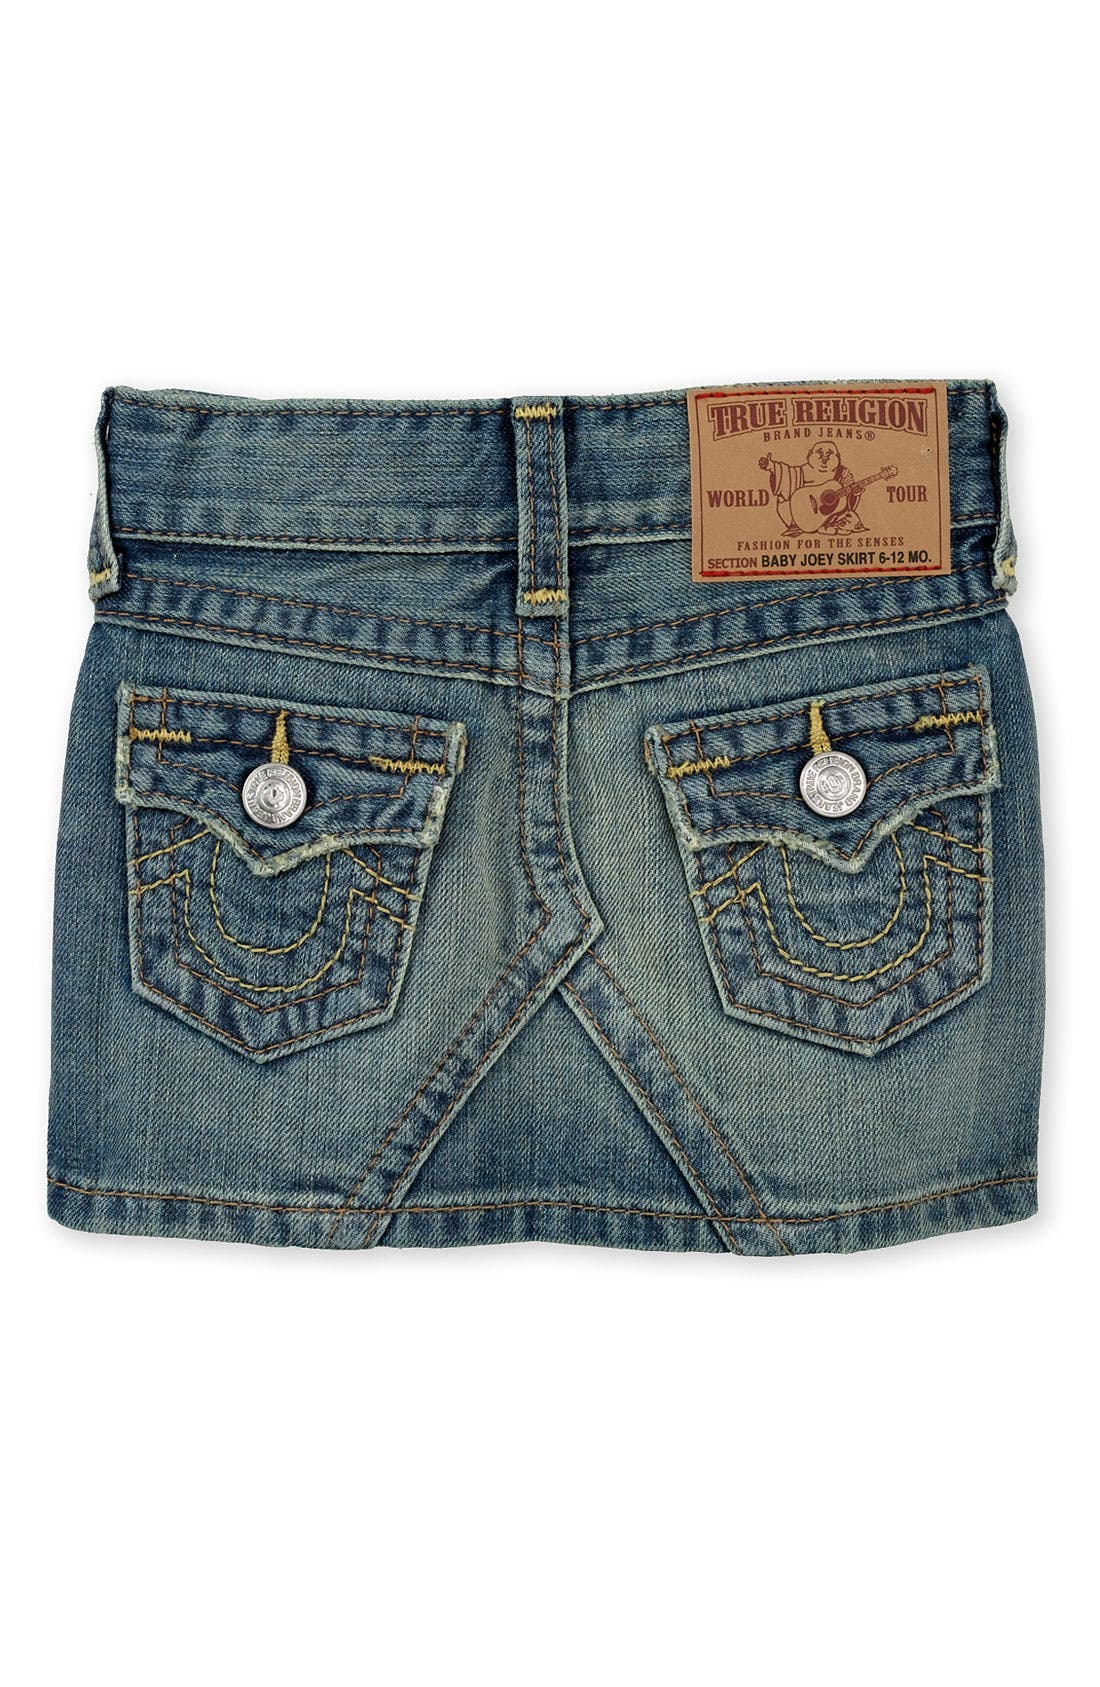 true religion brand baby joey jean skirt infant